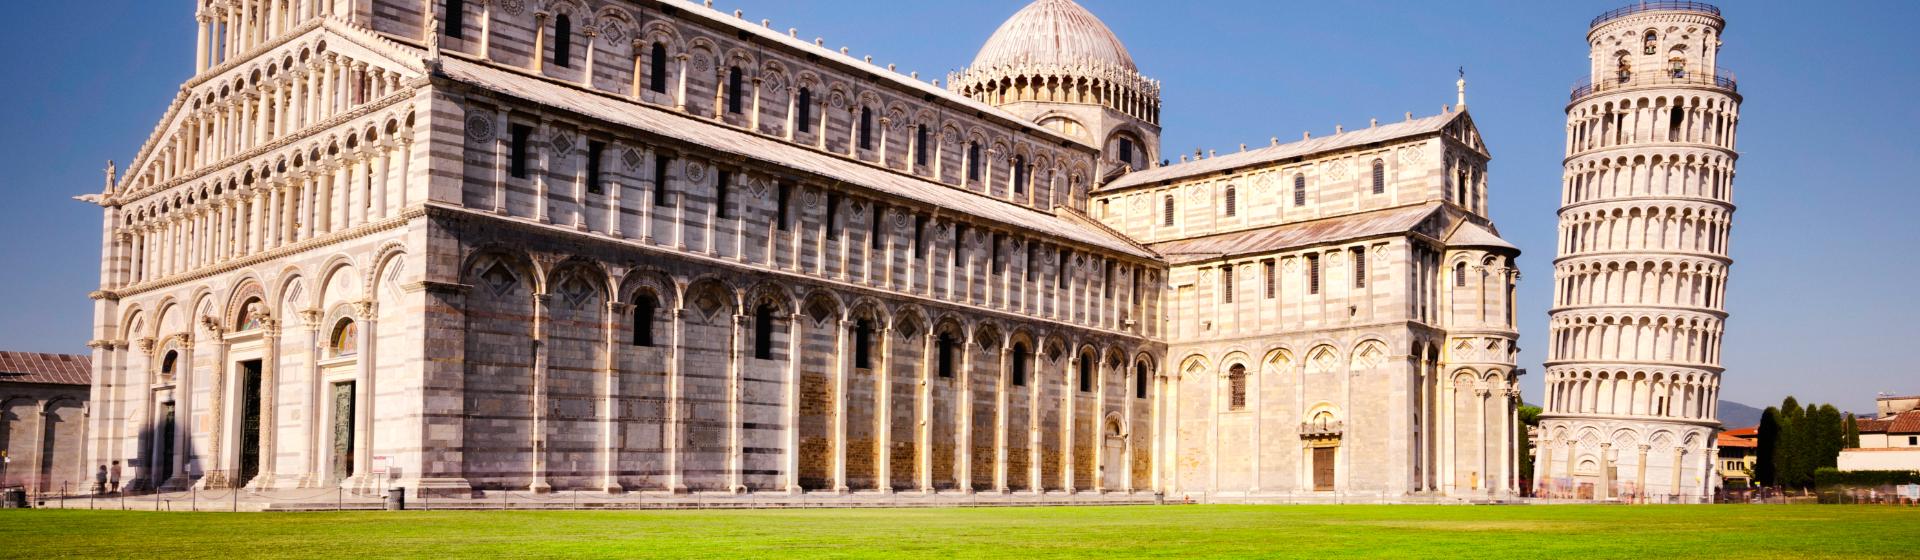 A.P.E.S. Pisa